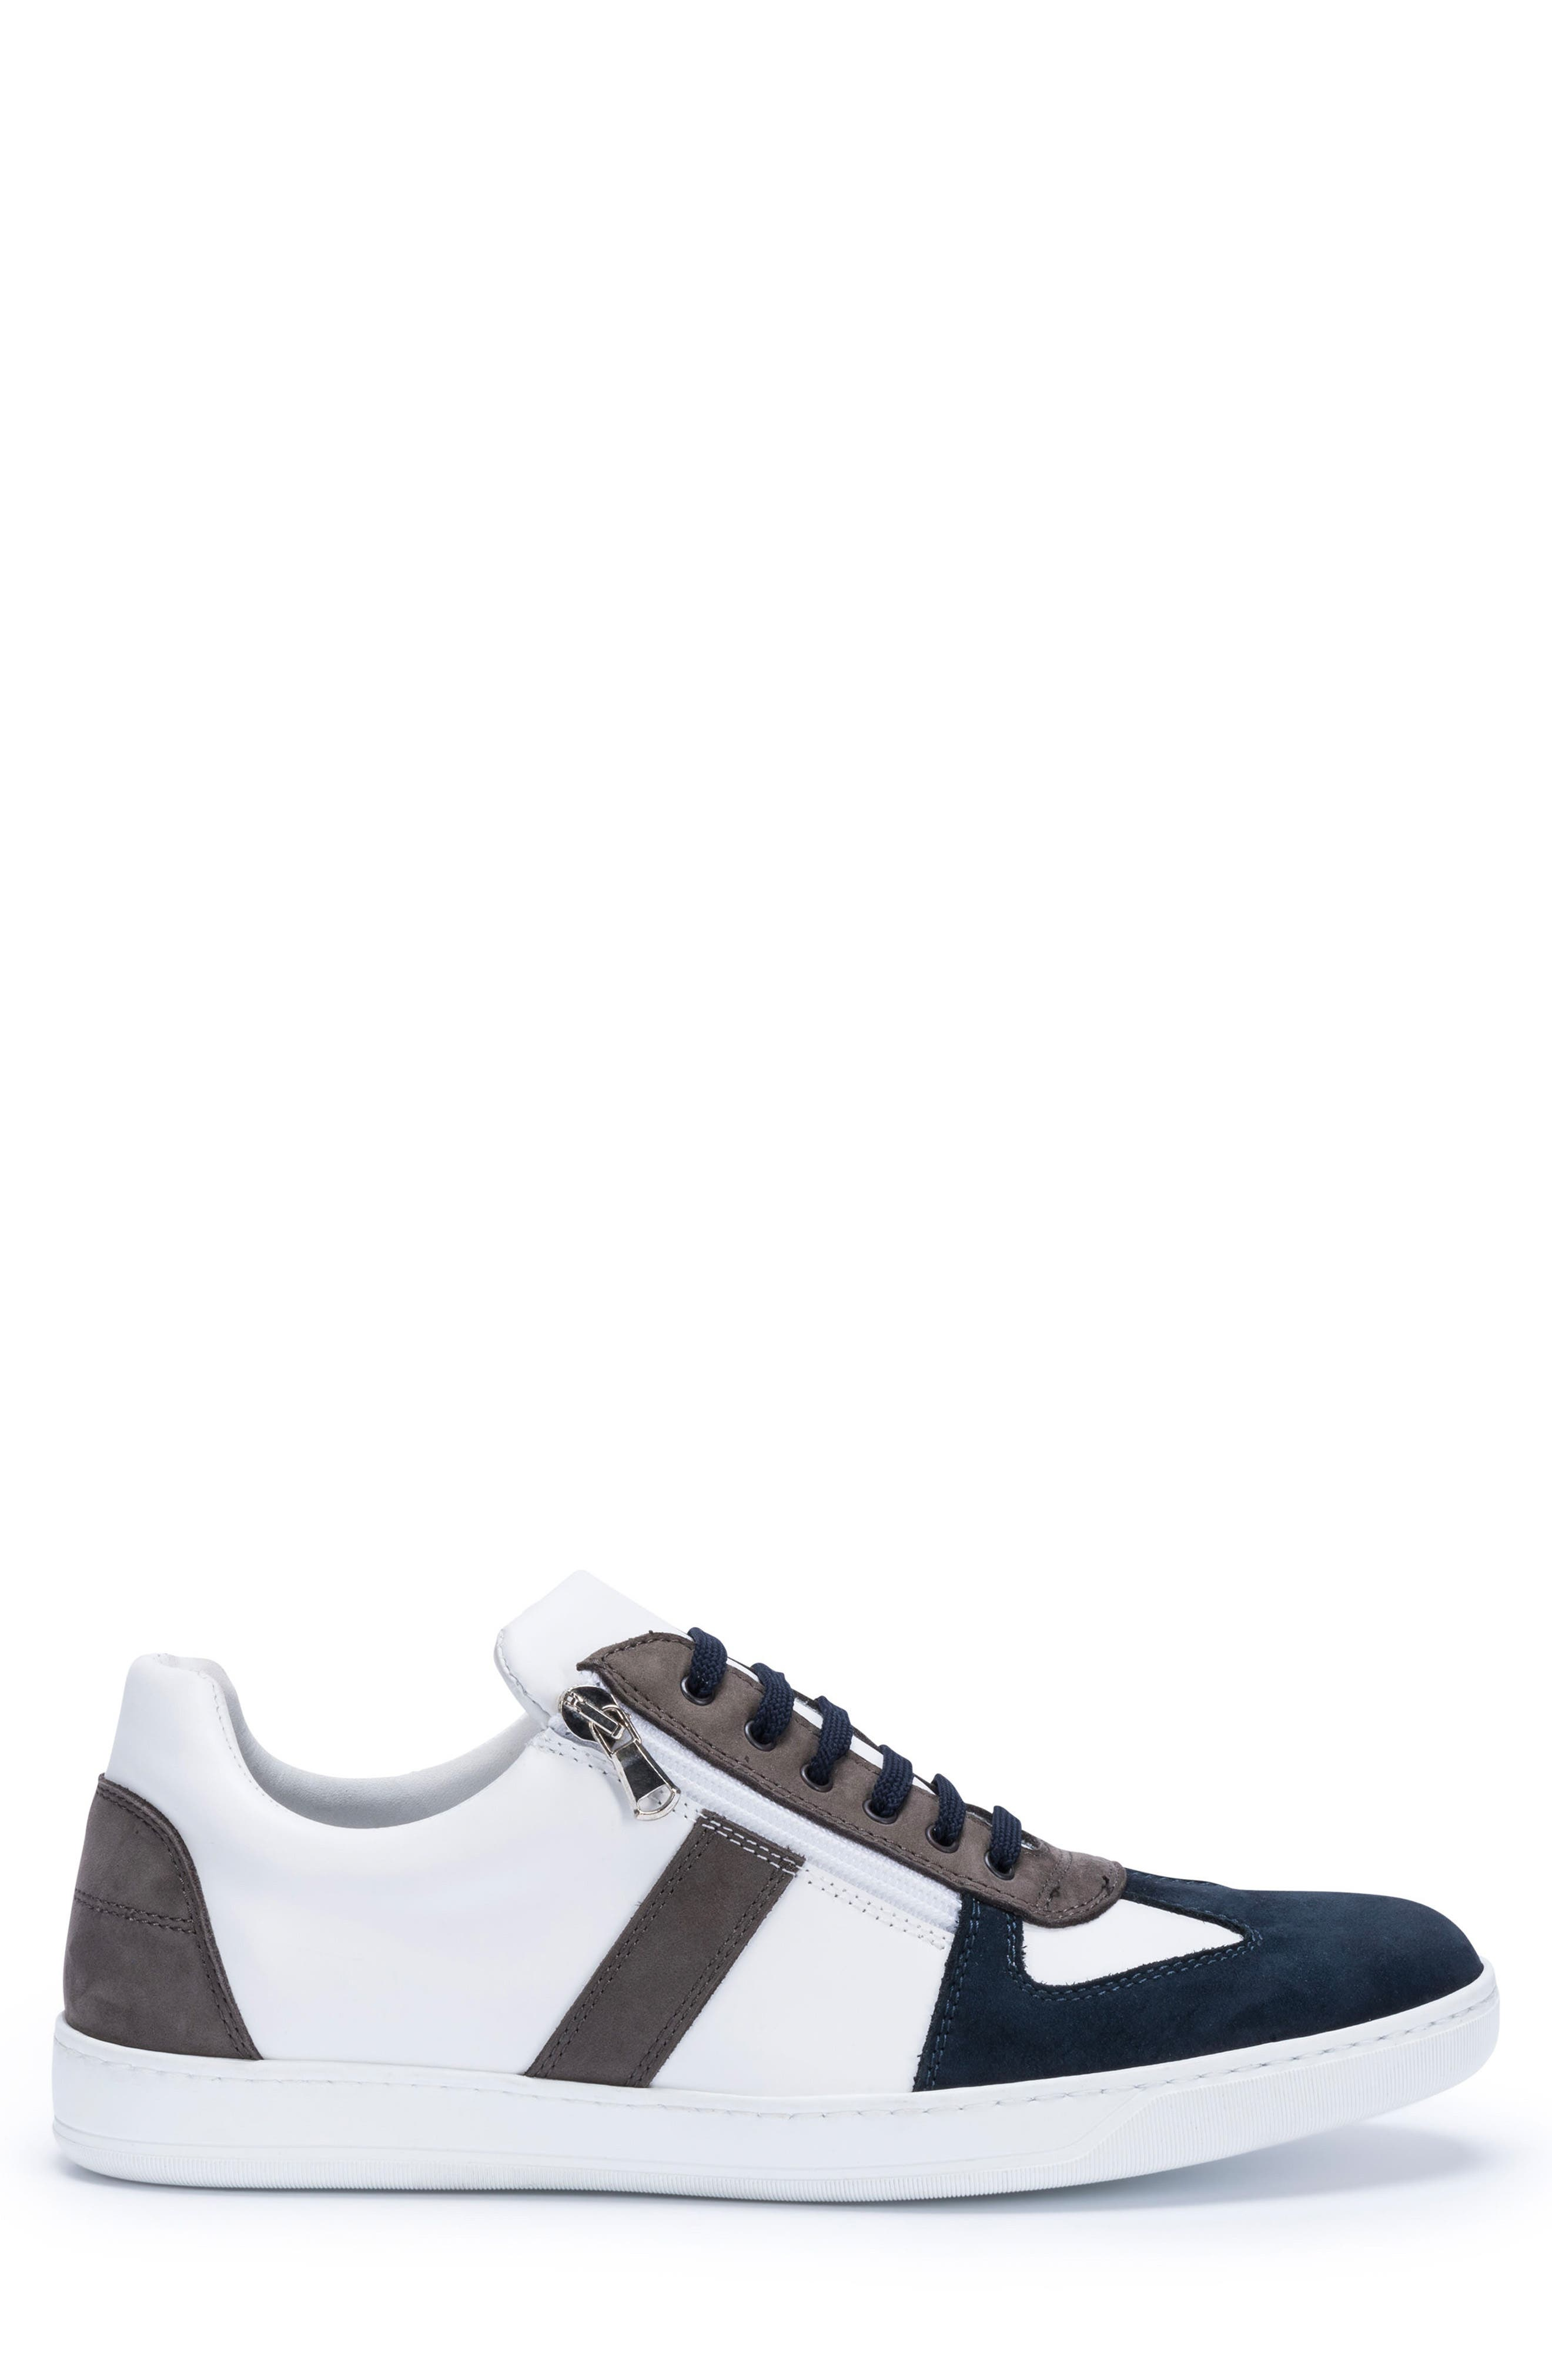 Calabria Sneaker,                             Alternate thumbnail 3, color,                             WHITE